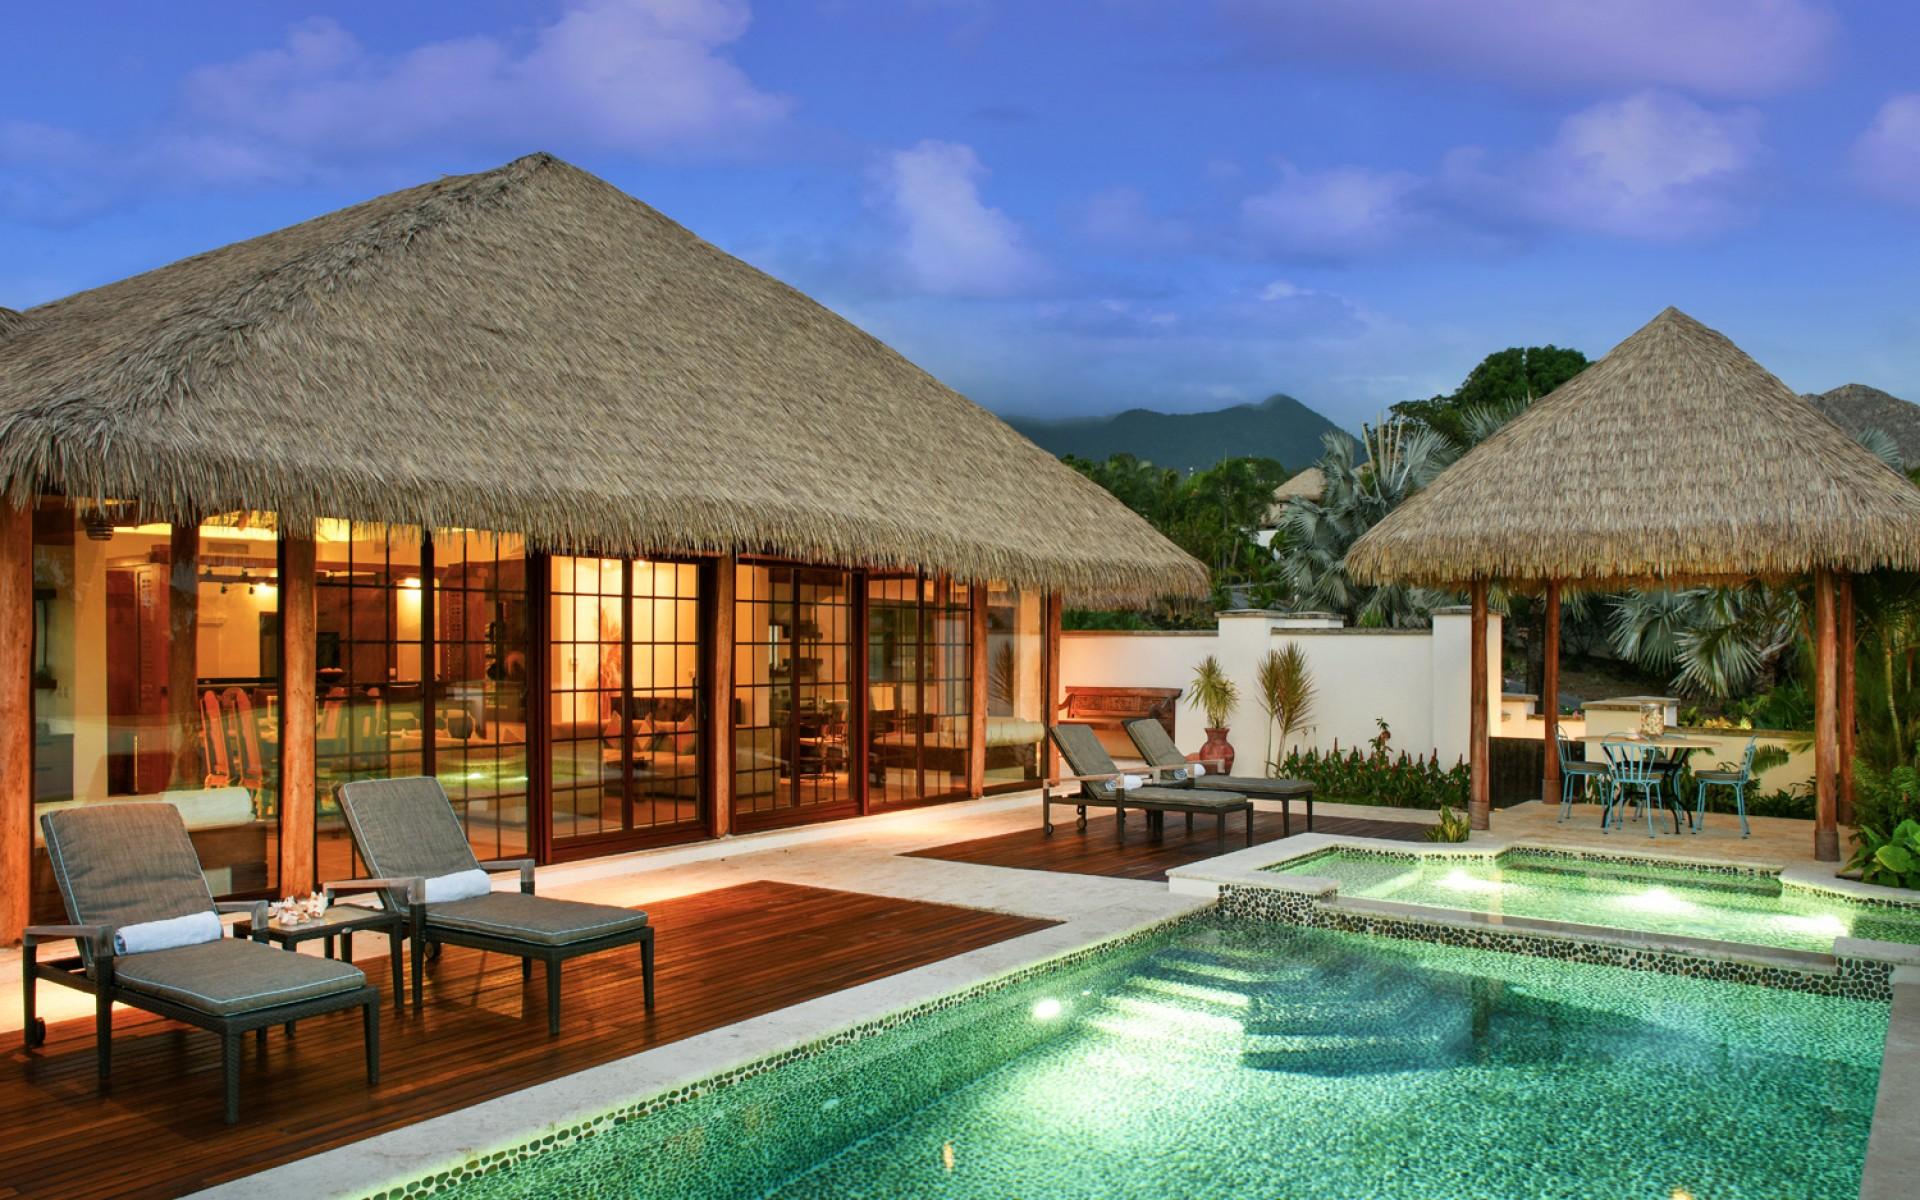 Hotel Nevis Wellness And Spa Paradise Beach Nevis Luxury Caribbean Villas